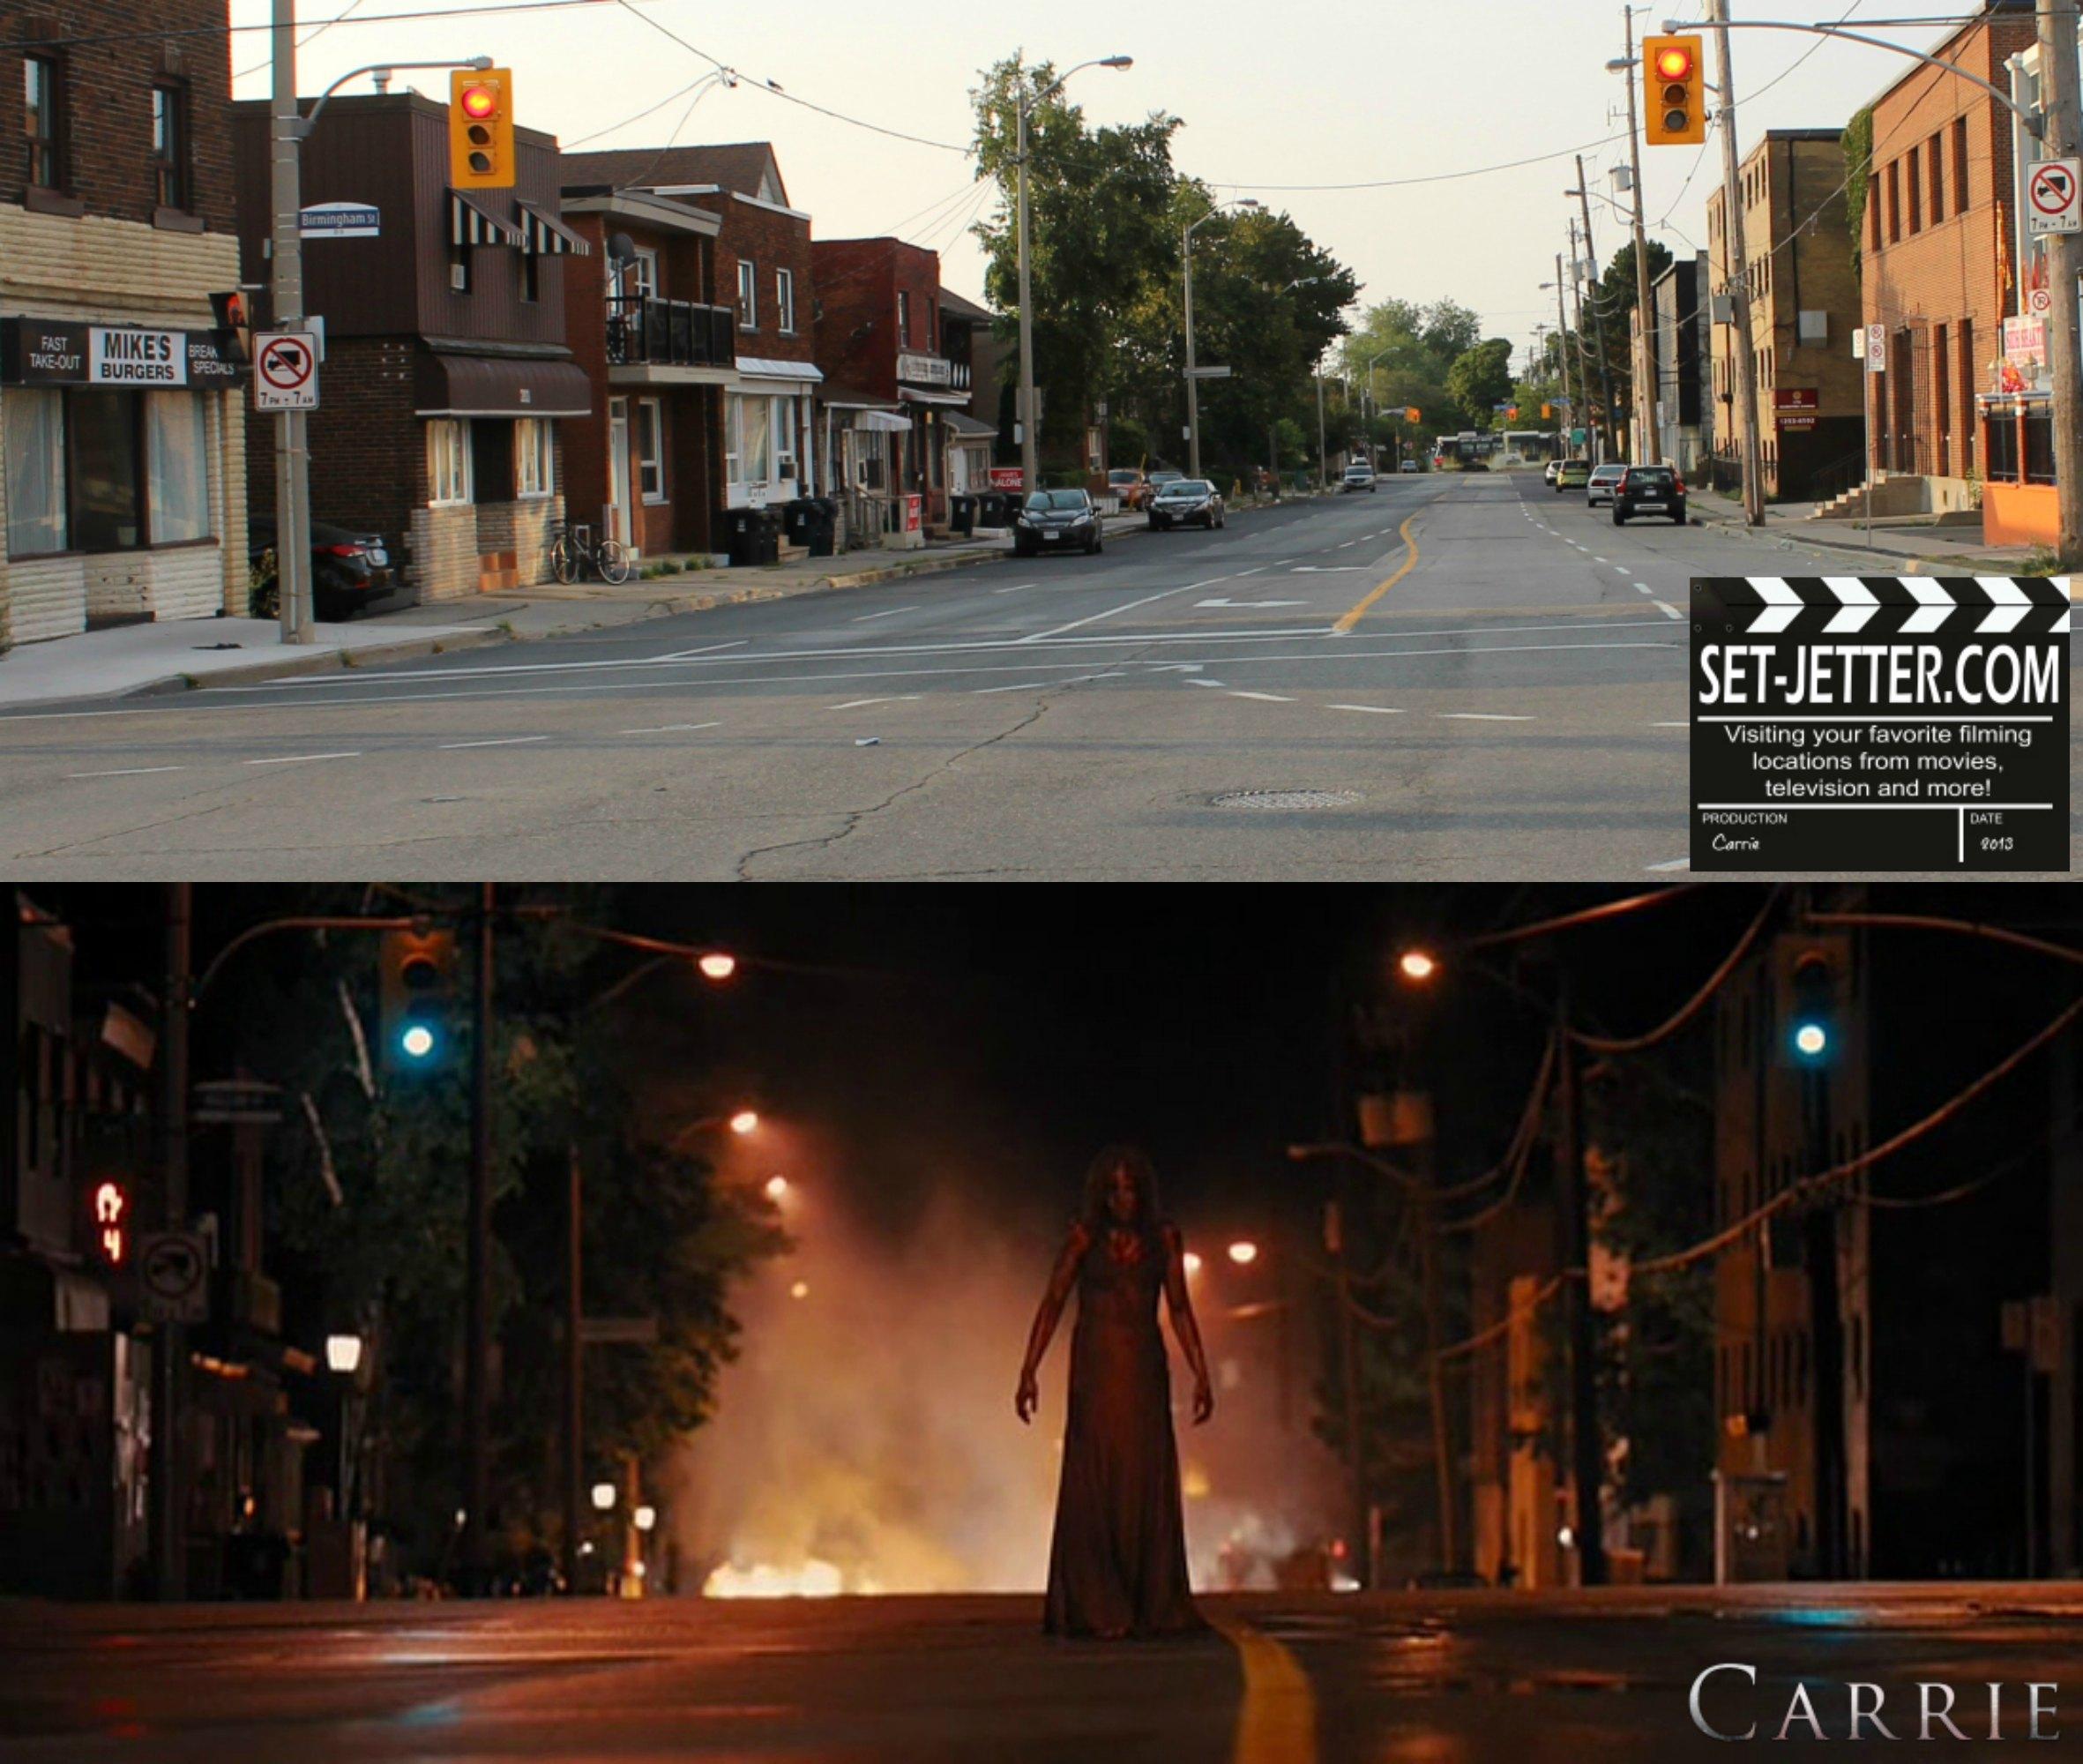 Carrie 2013 comparison 166.jpg